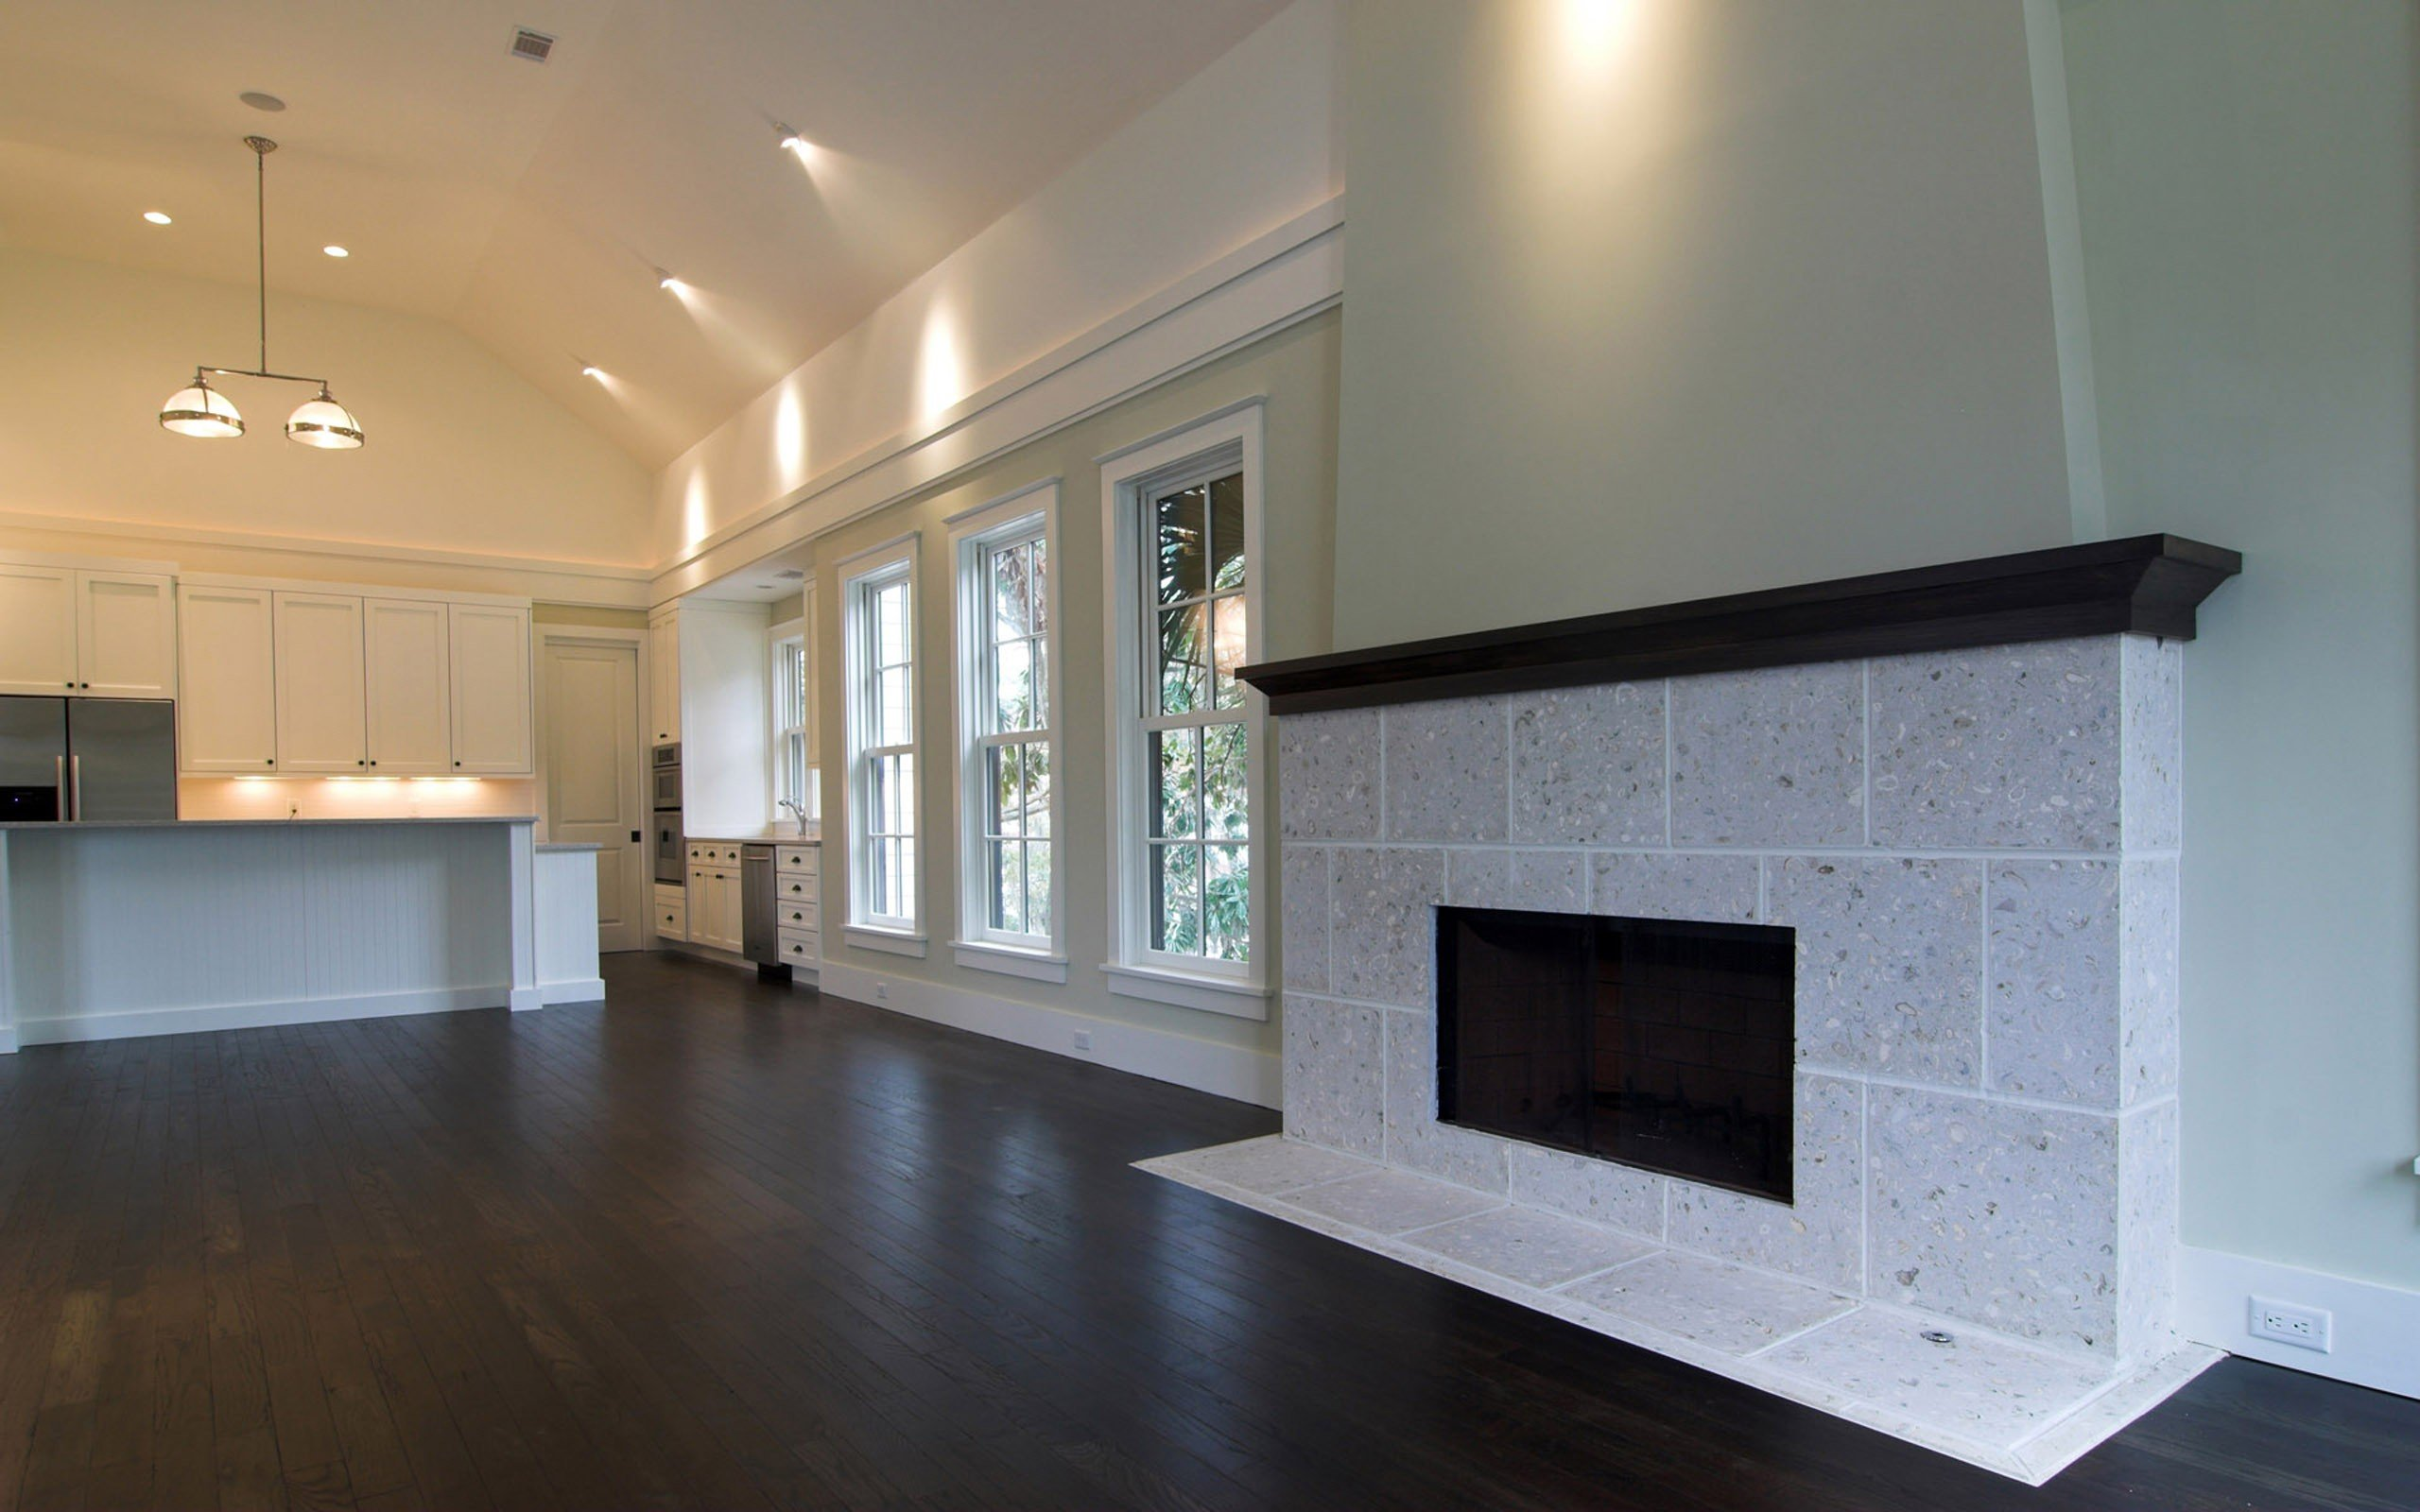 architecture living room empty interior design wallpaper 2560x1600 310081 wallpaperup